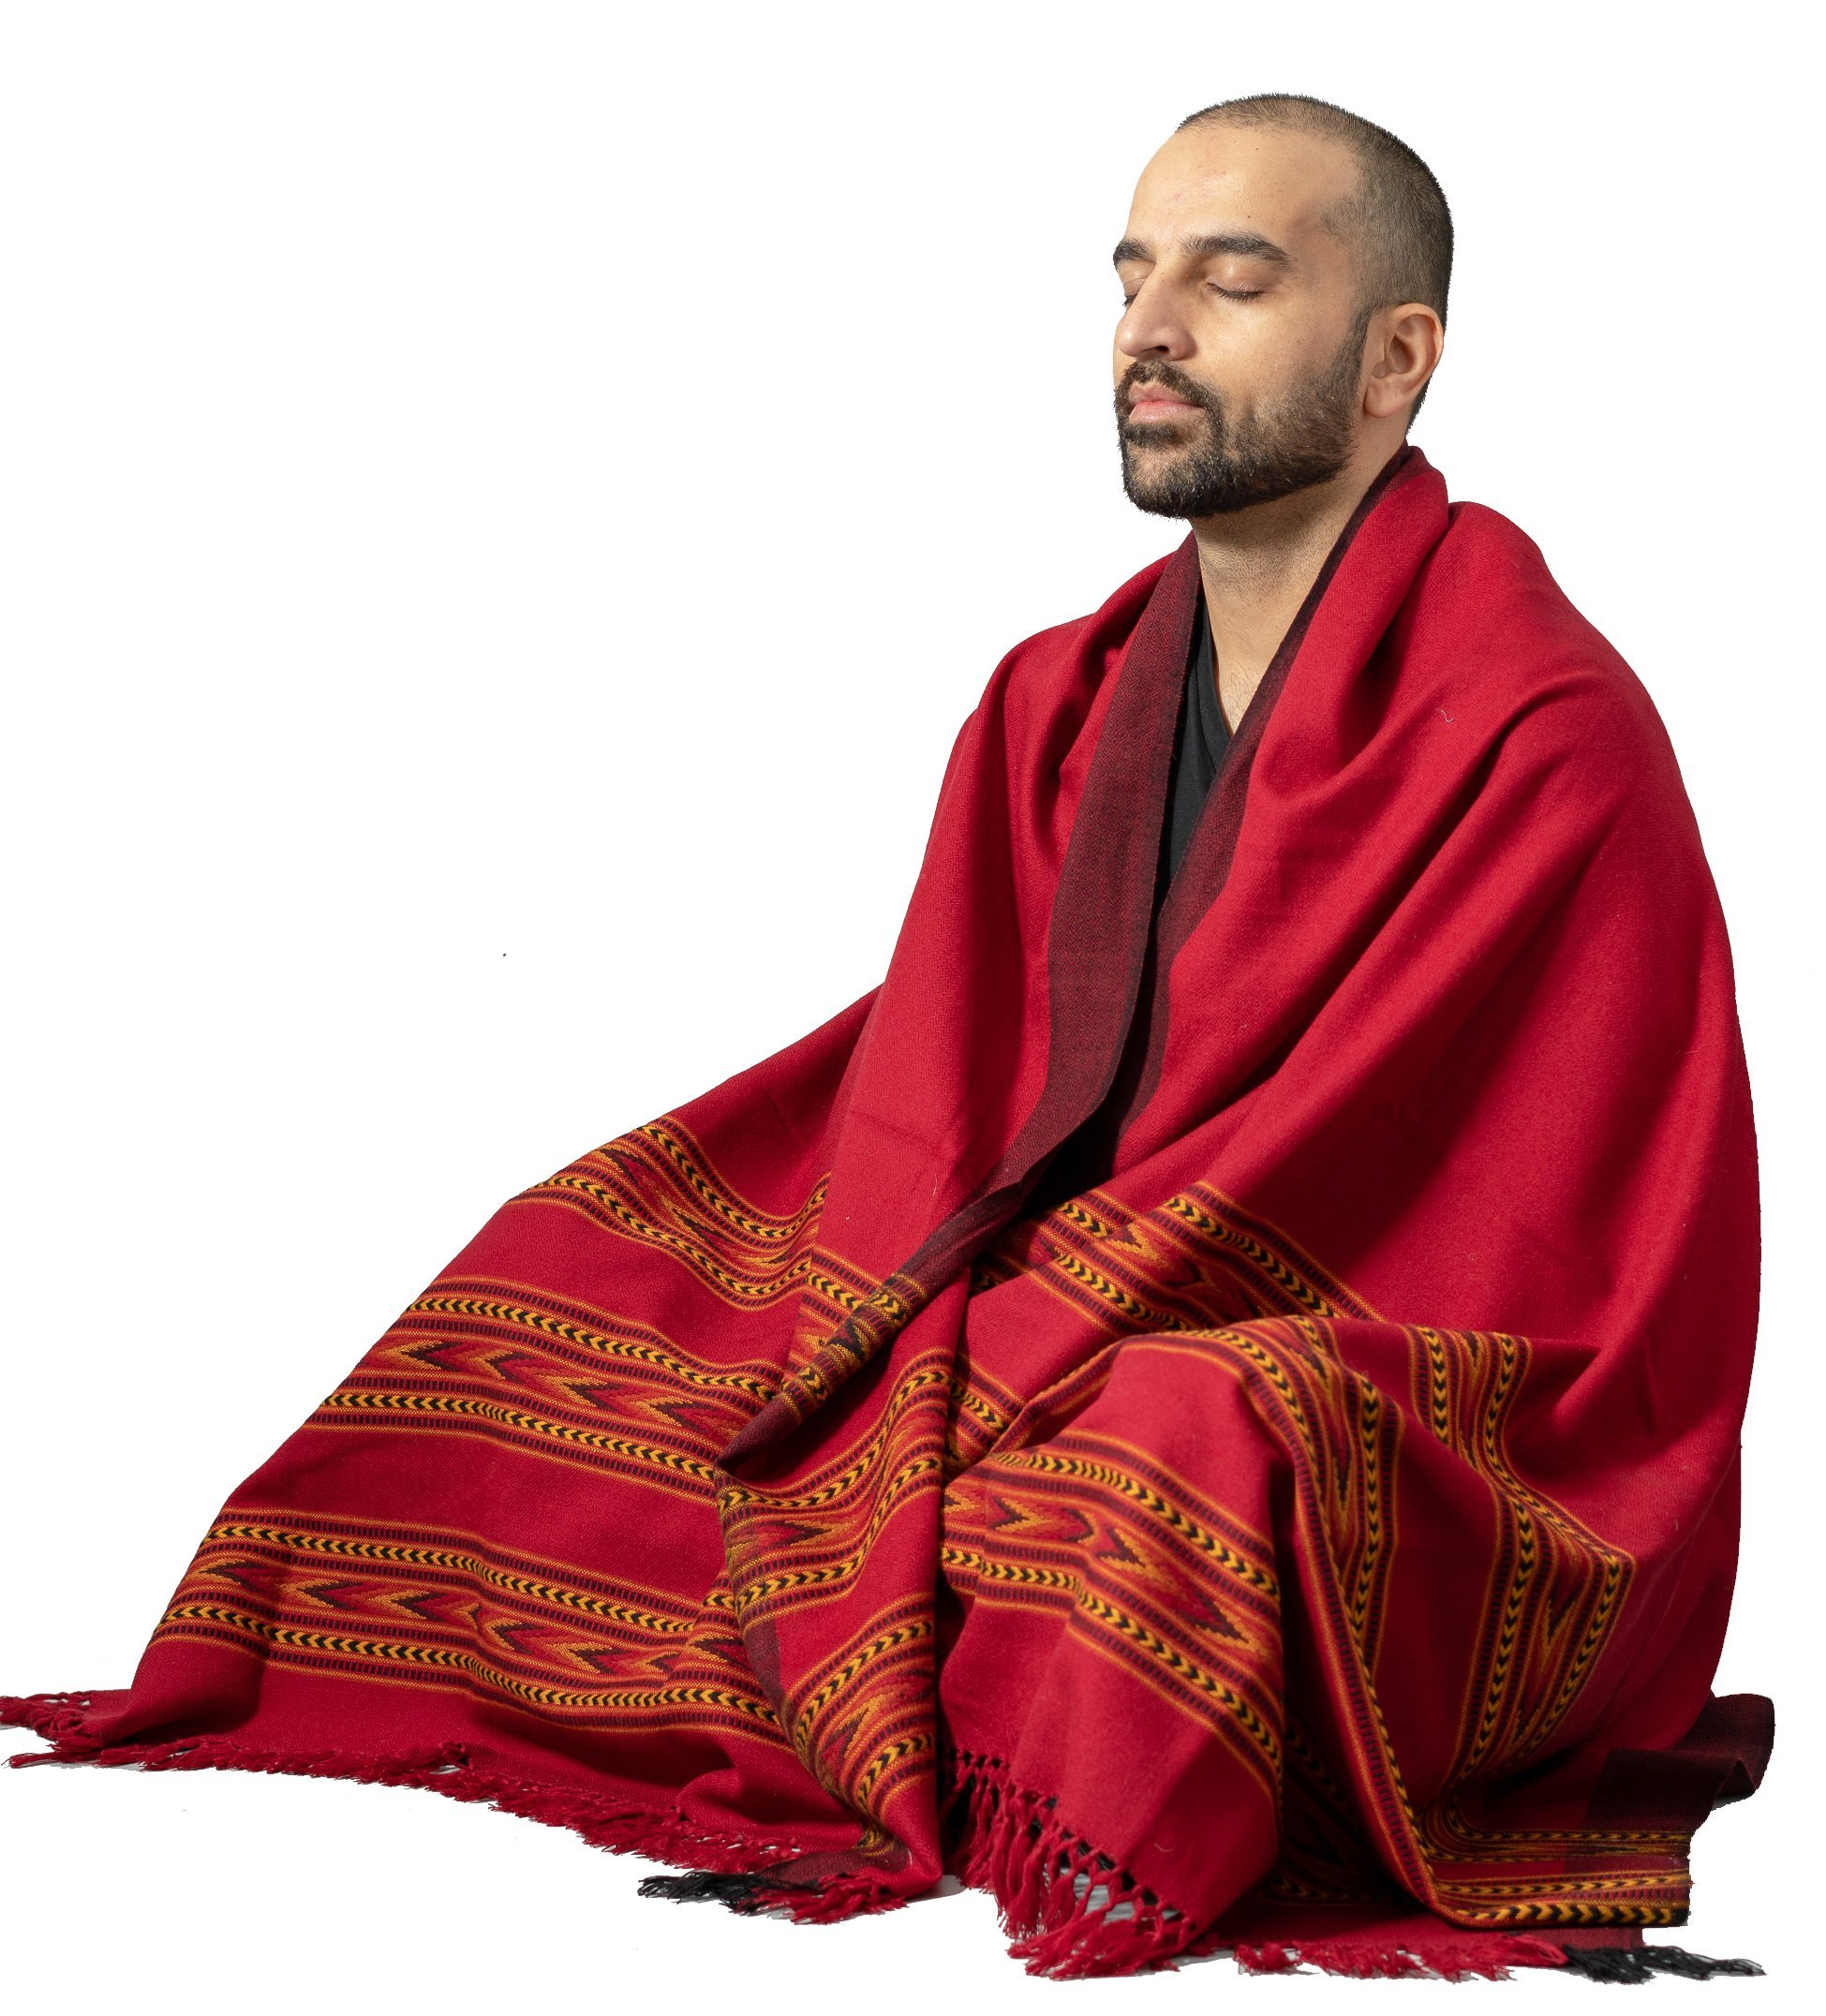 Meditation Shawl by Om Shanti Crafts | Prayer Shawl, Buddha Blanket, Oversize Scarf Wool Wrap to Strengthen Your Daily Meditation, Unisex (Extra Large 7.5'x3.5') (Red)